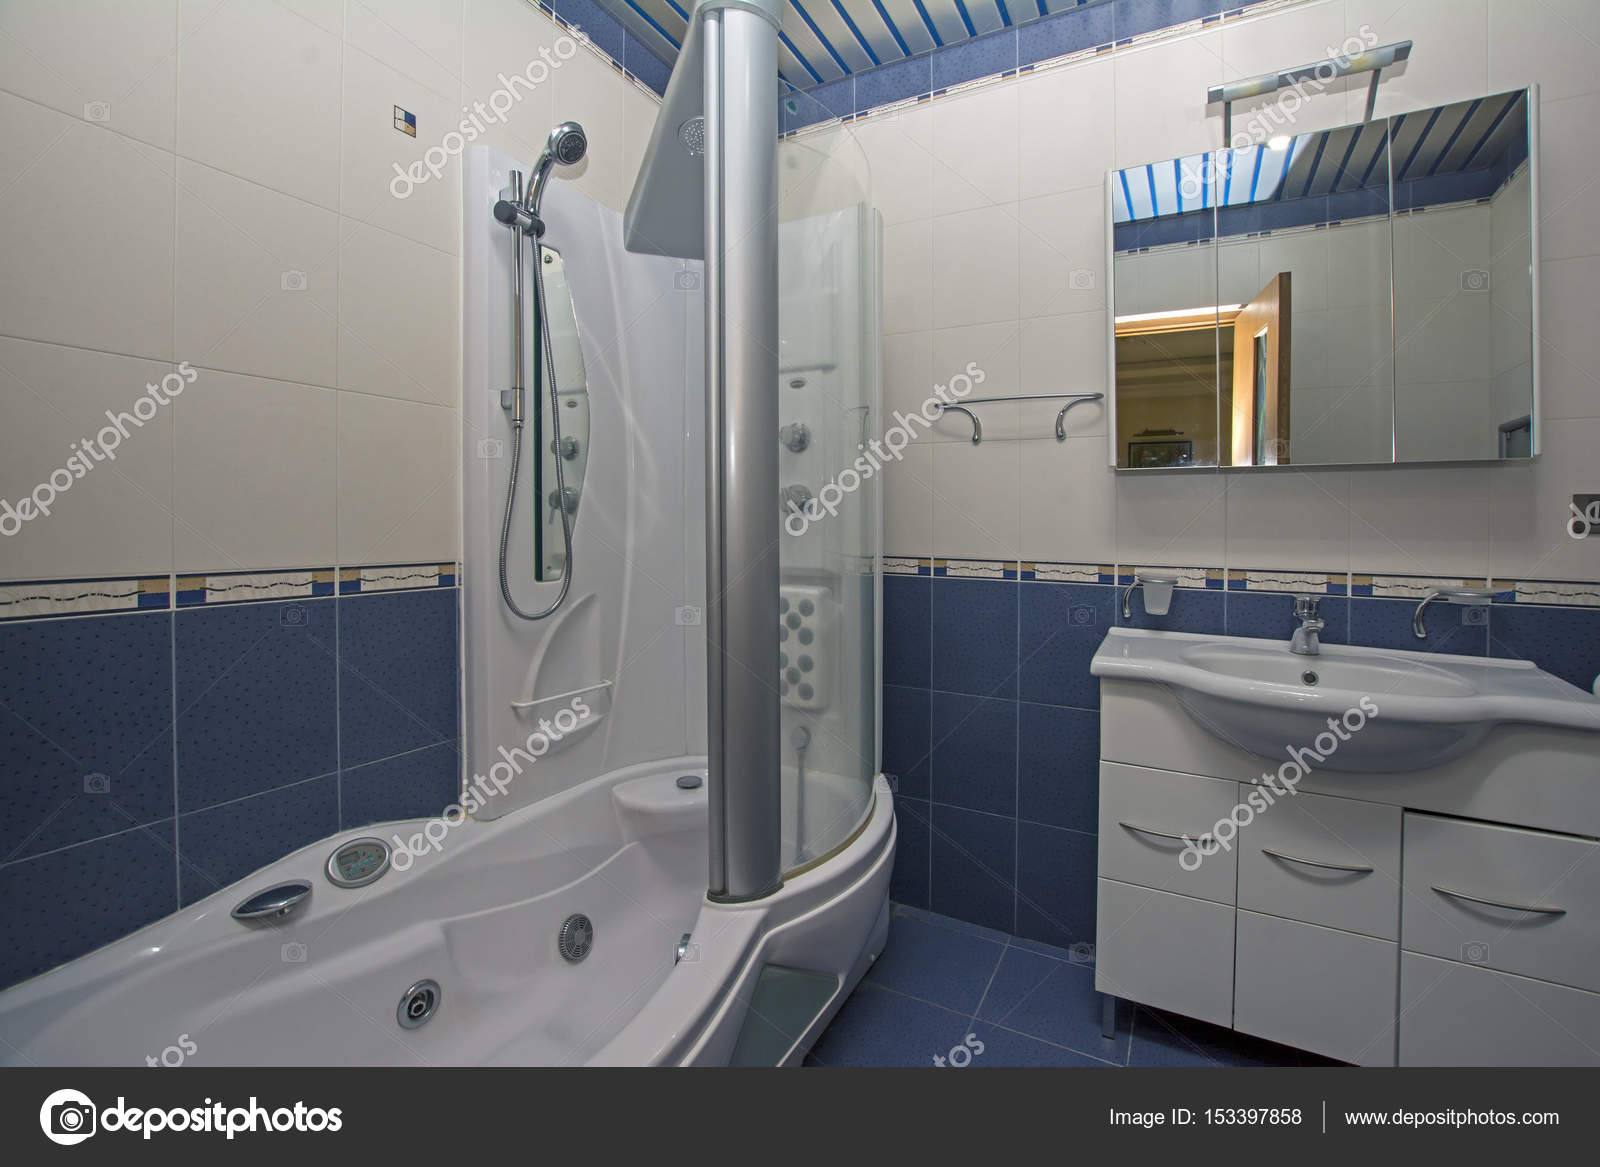 Erevan (Arménie)-17 avril 2017 : salle de bains moderne. Appartement ...